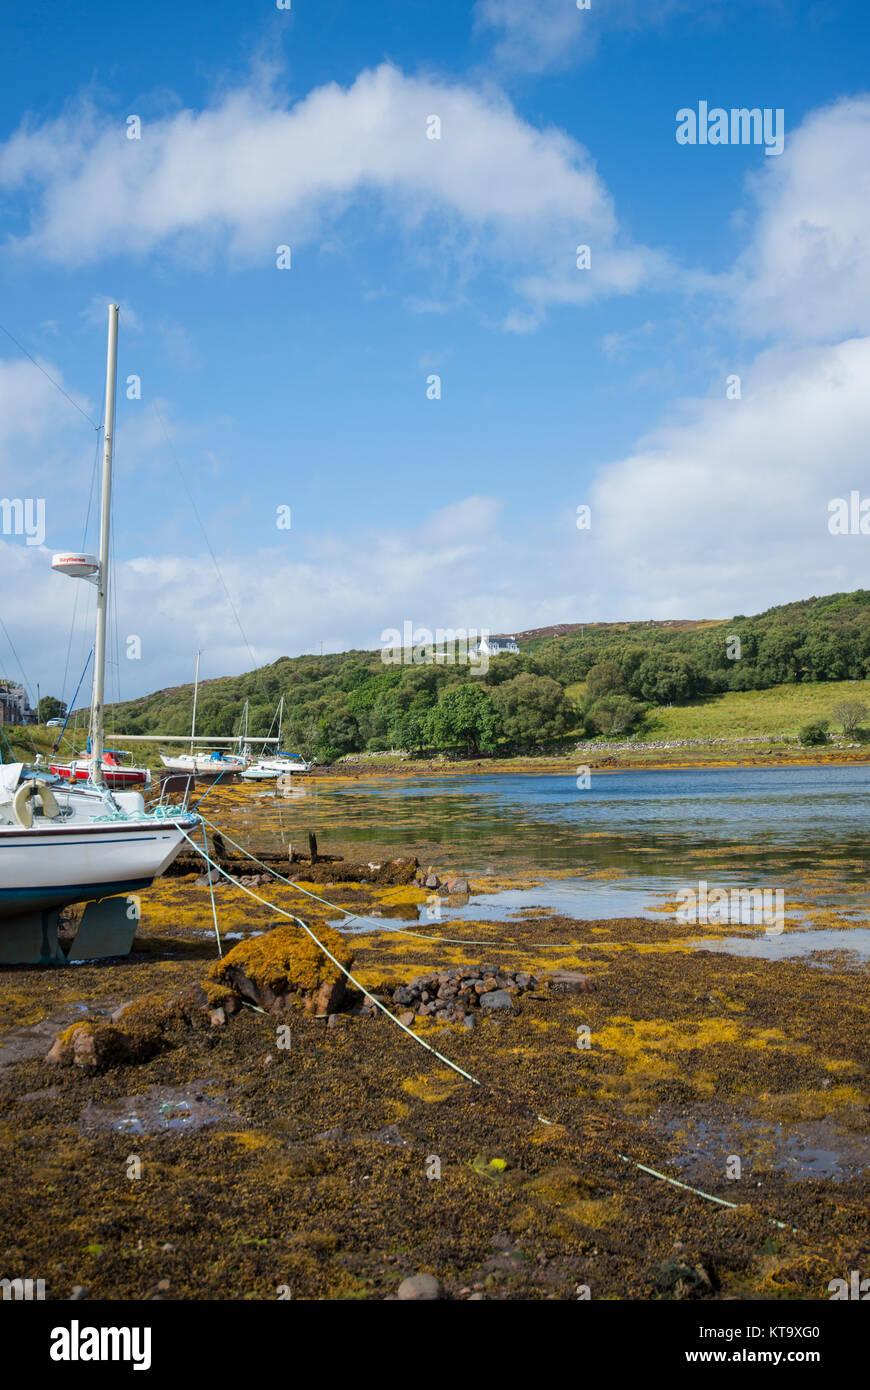 Badachro harbour near Gairloch in Wester Ross, Scotland - Stock Image